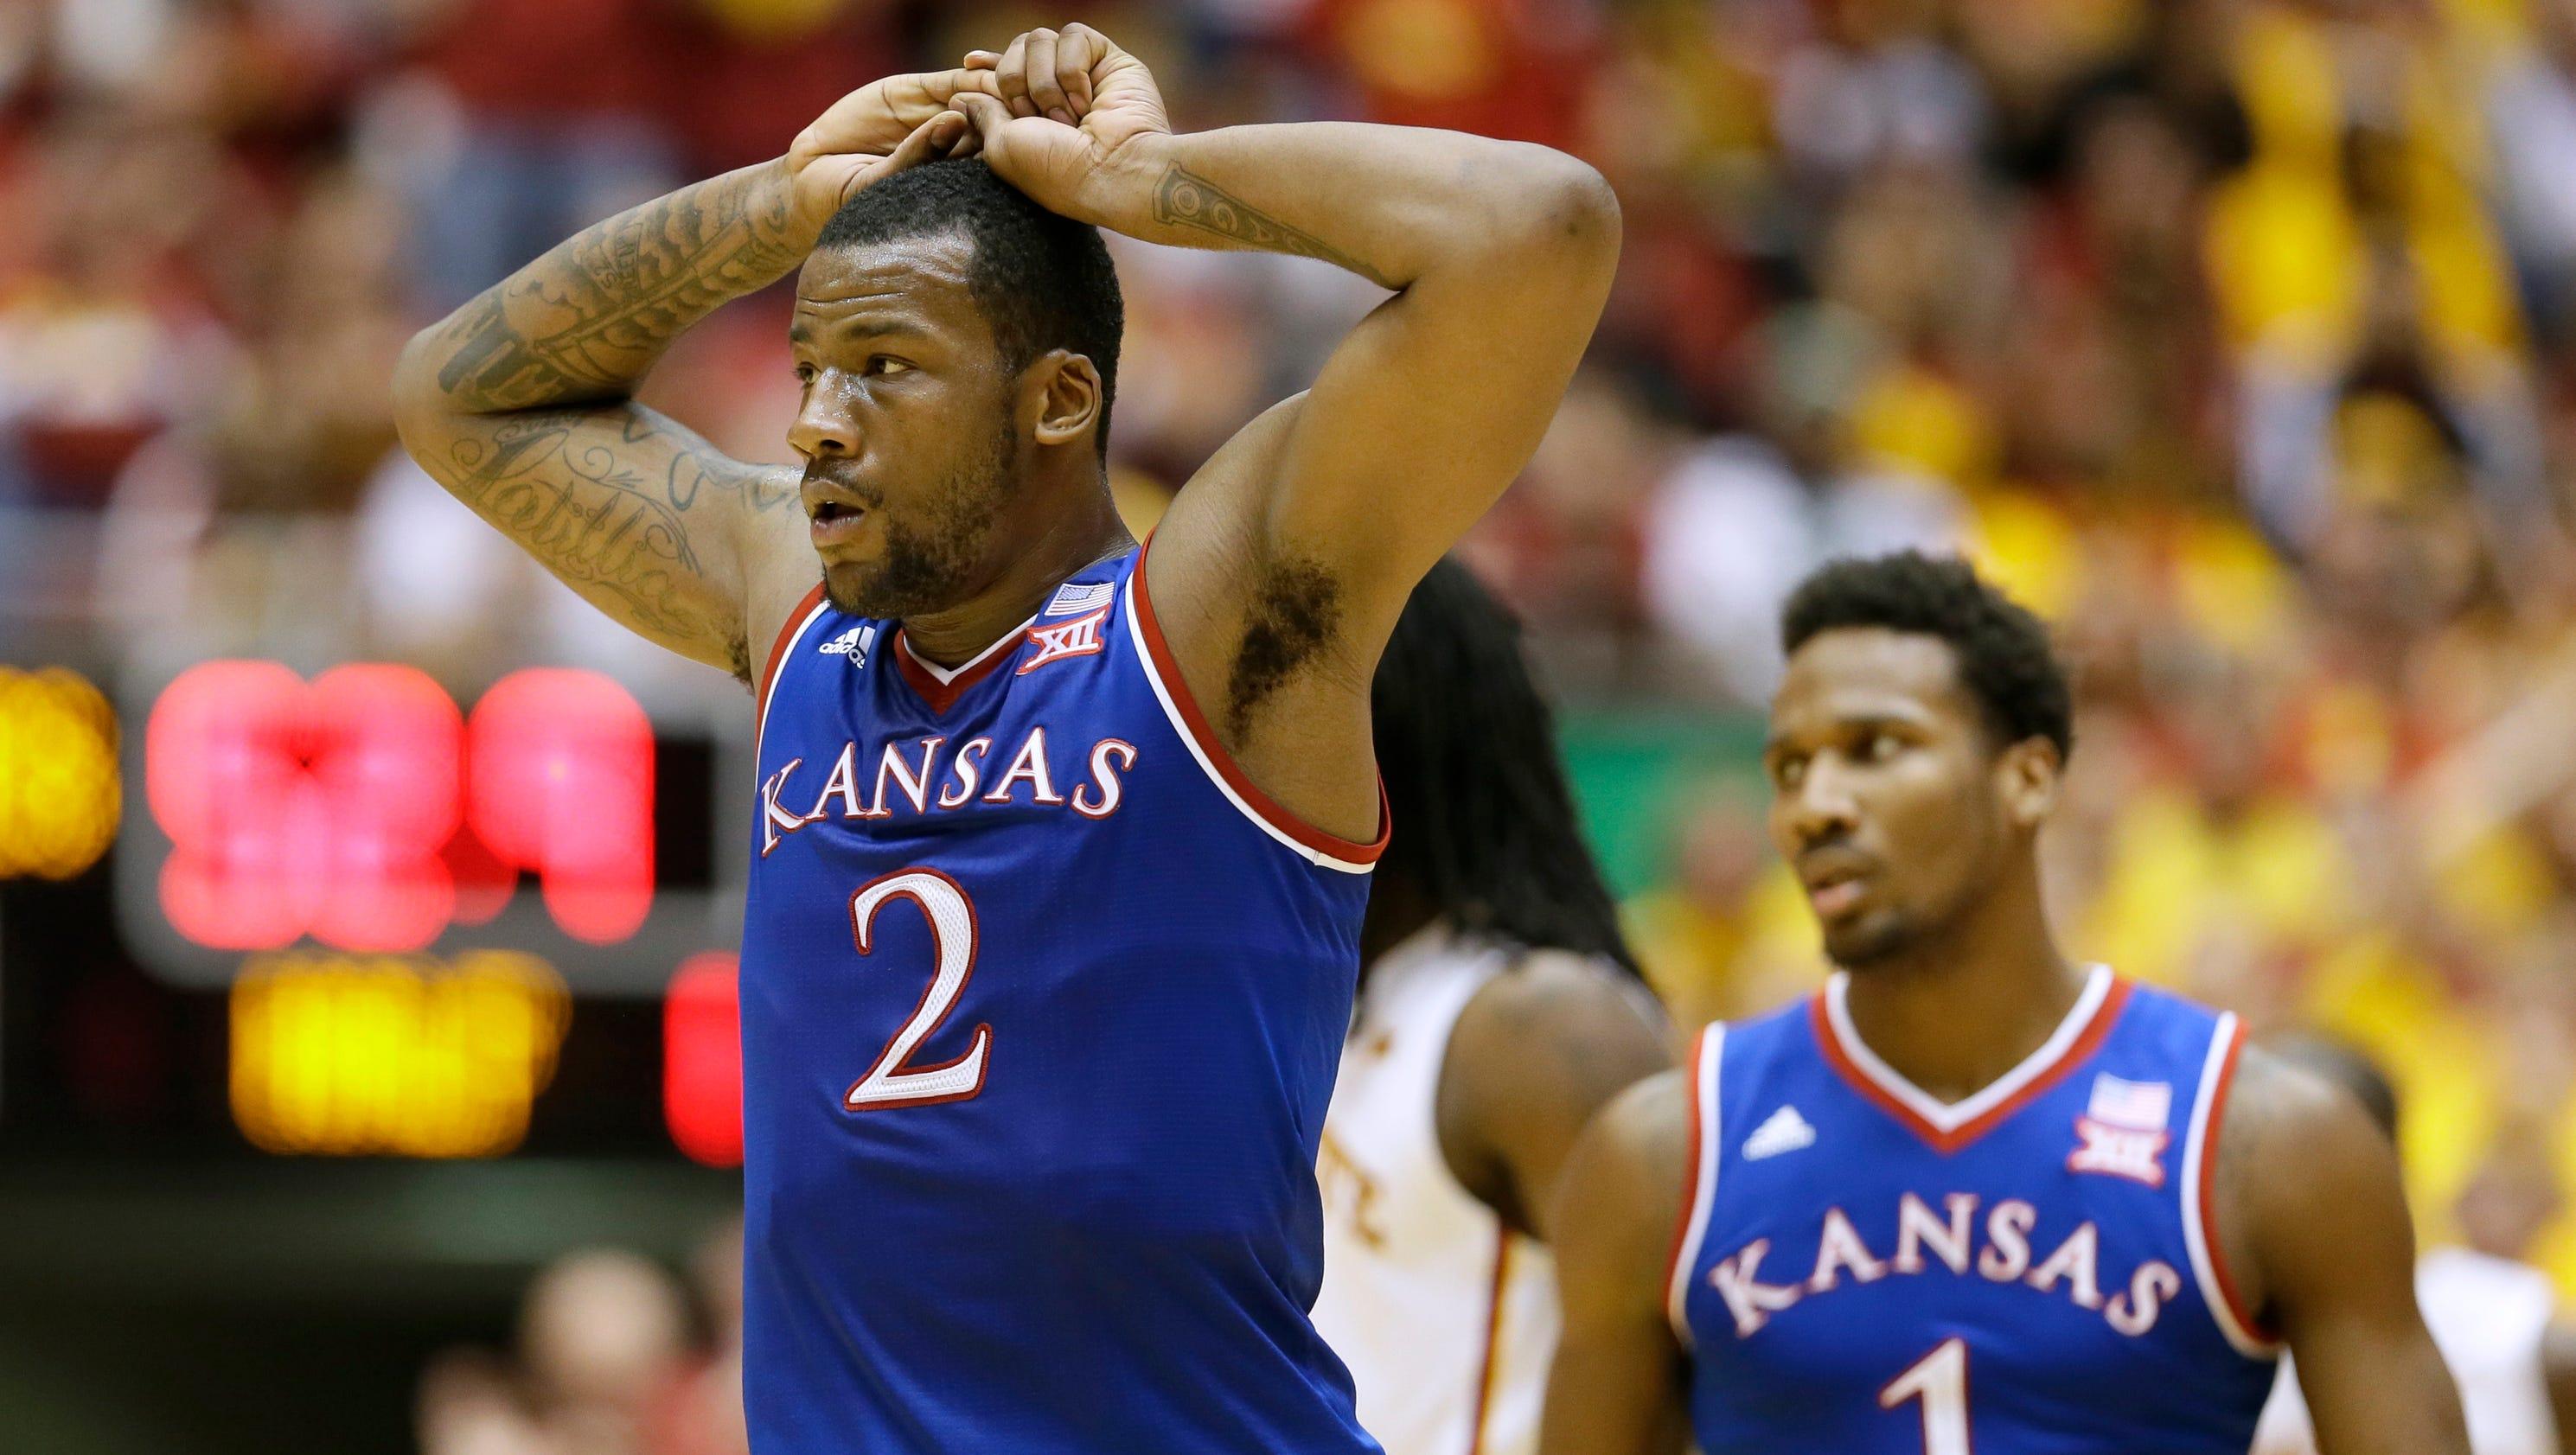 Cliff Alexander: I got a 'bad deck of cards' at Kansas